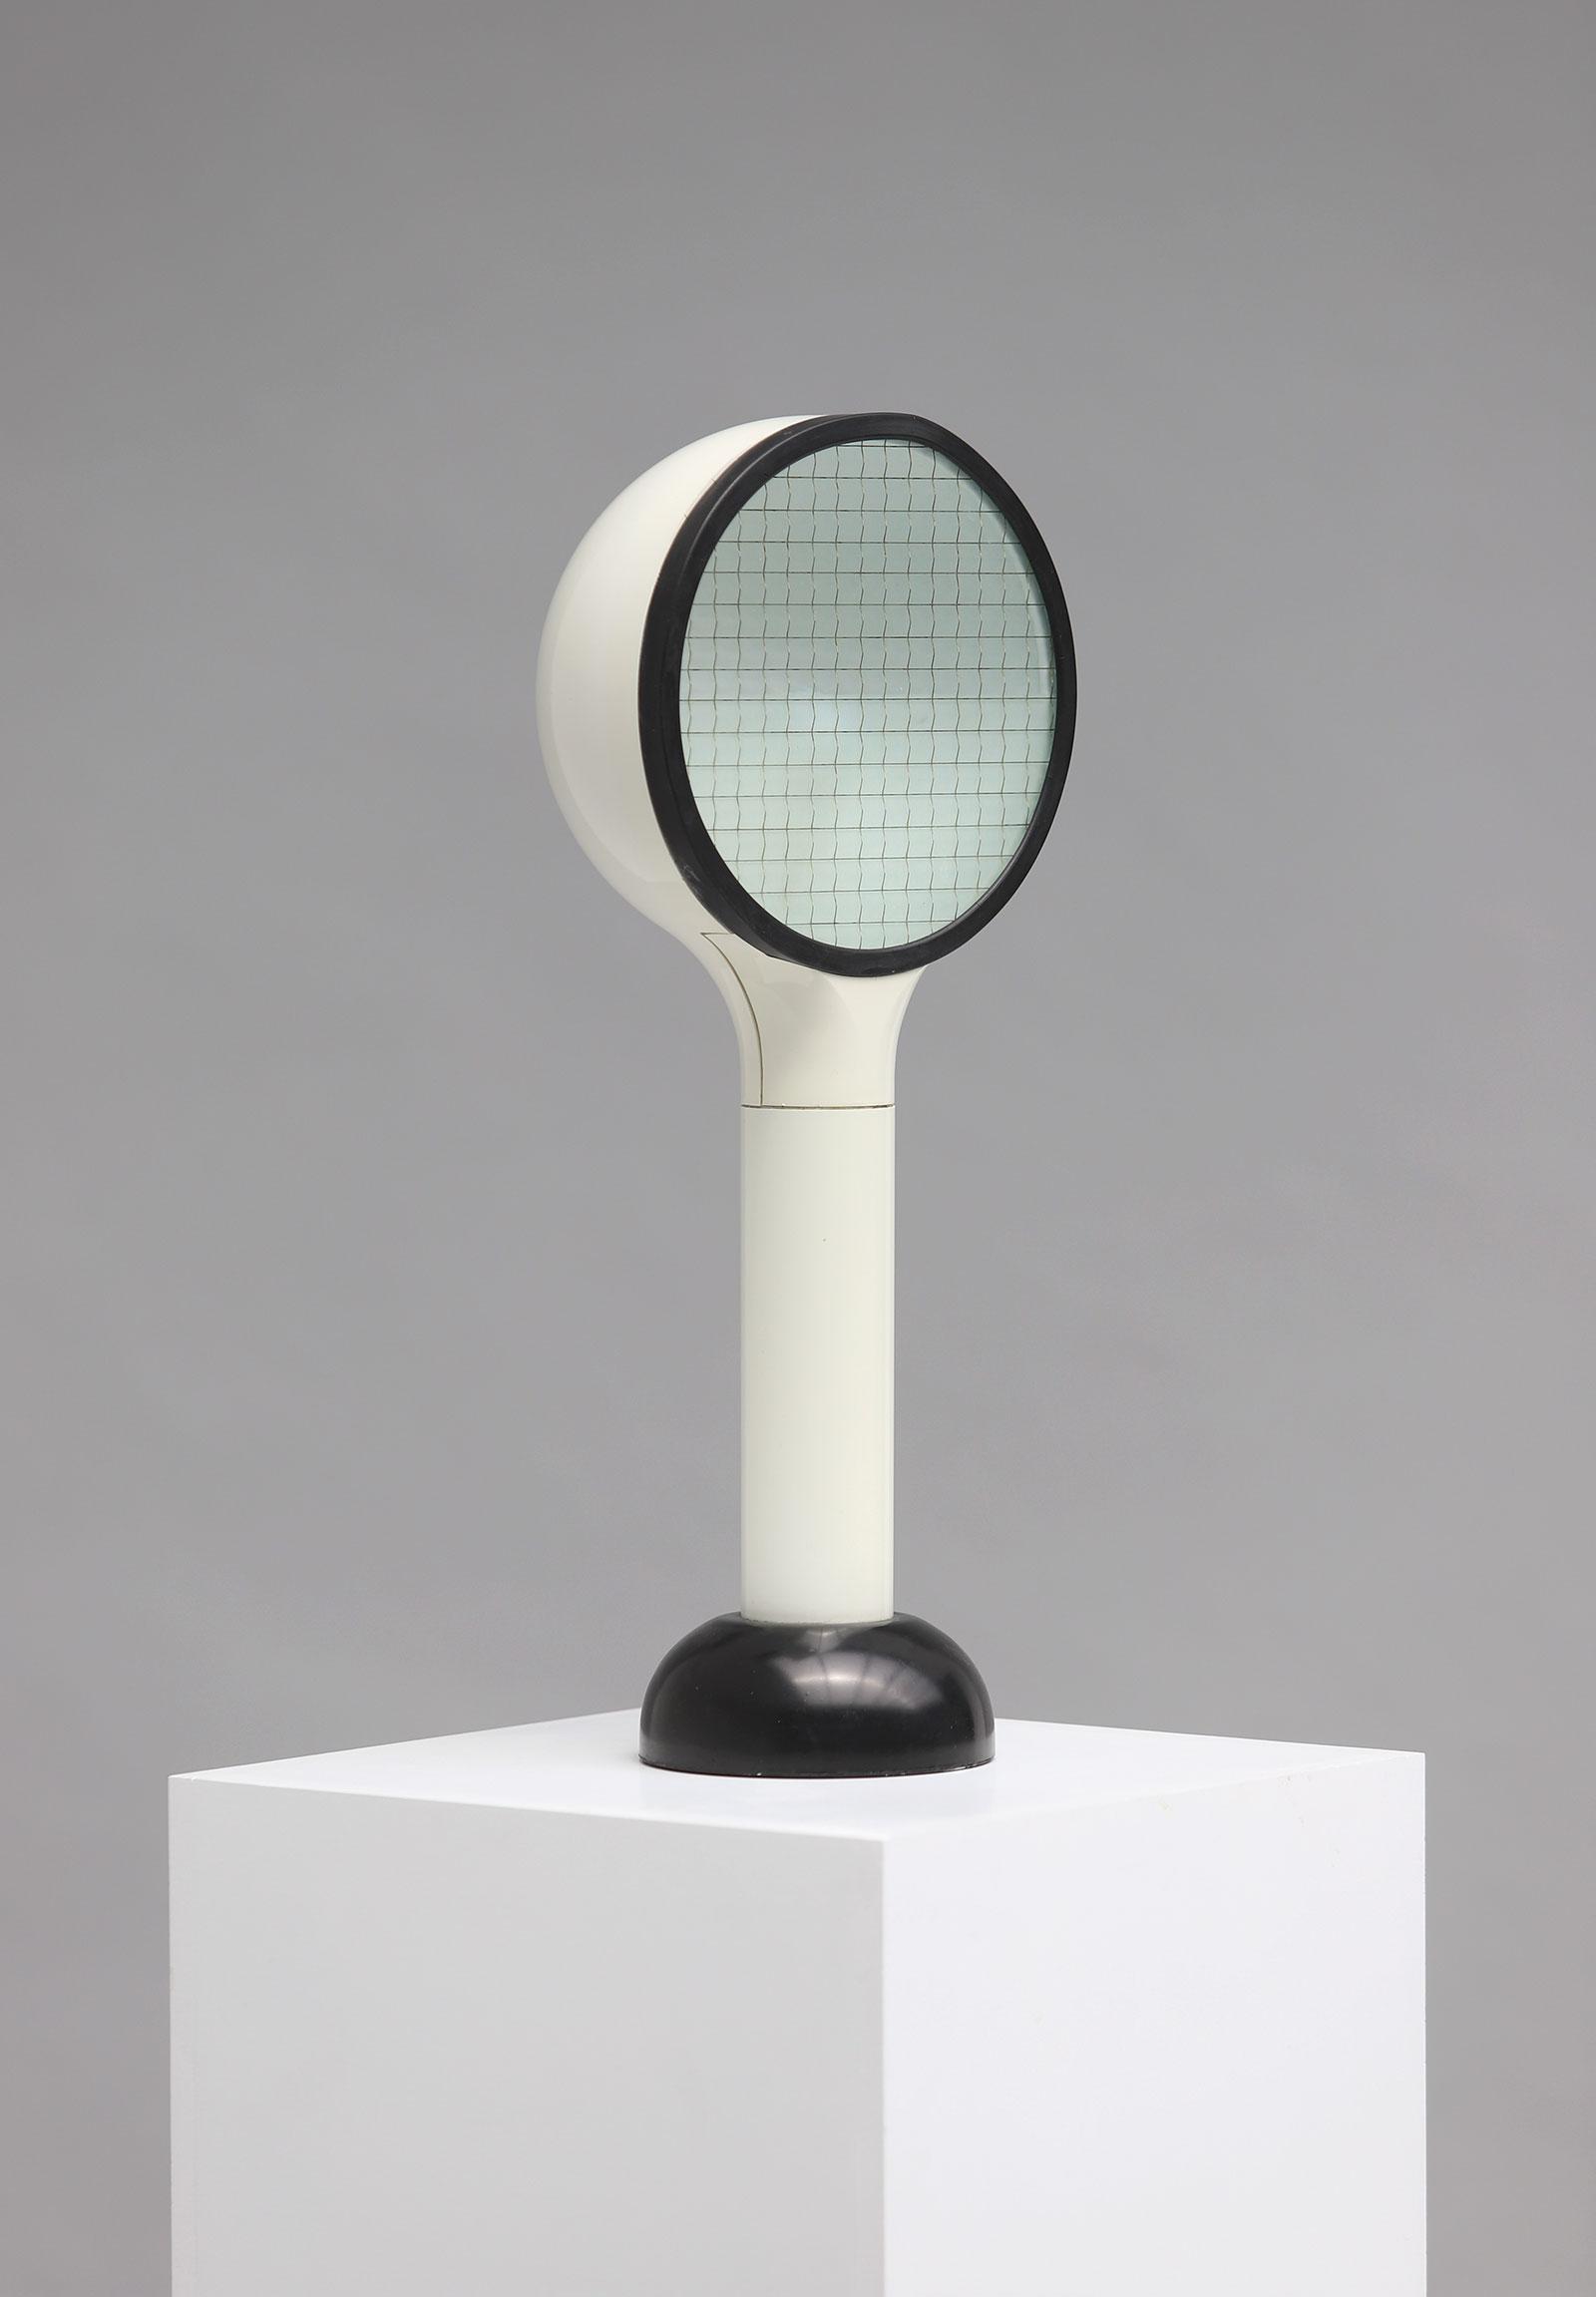 Drive table lamp designed by Adalberto Dal Lago for Bieffeplast- Fran